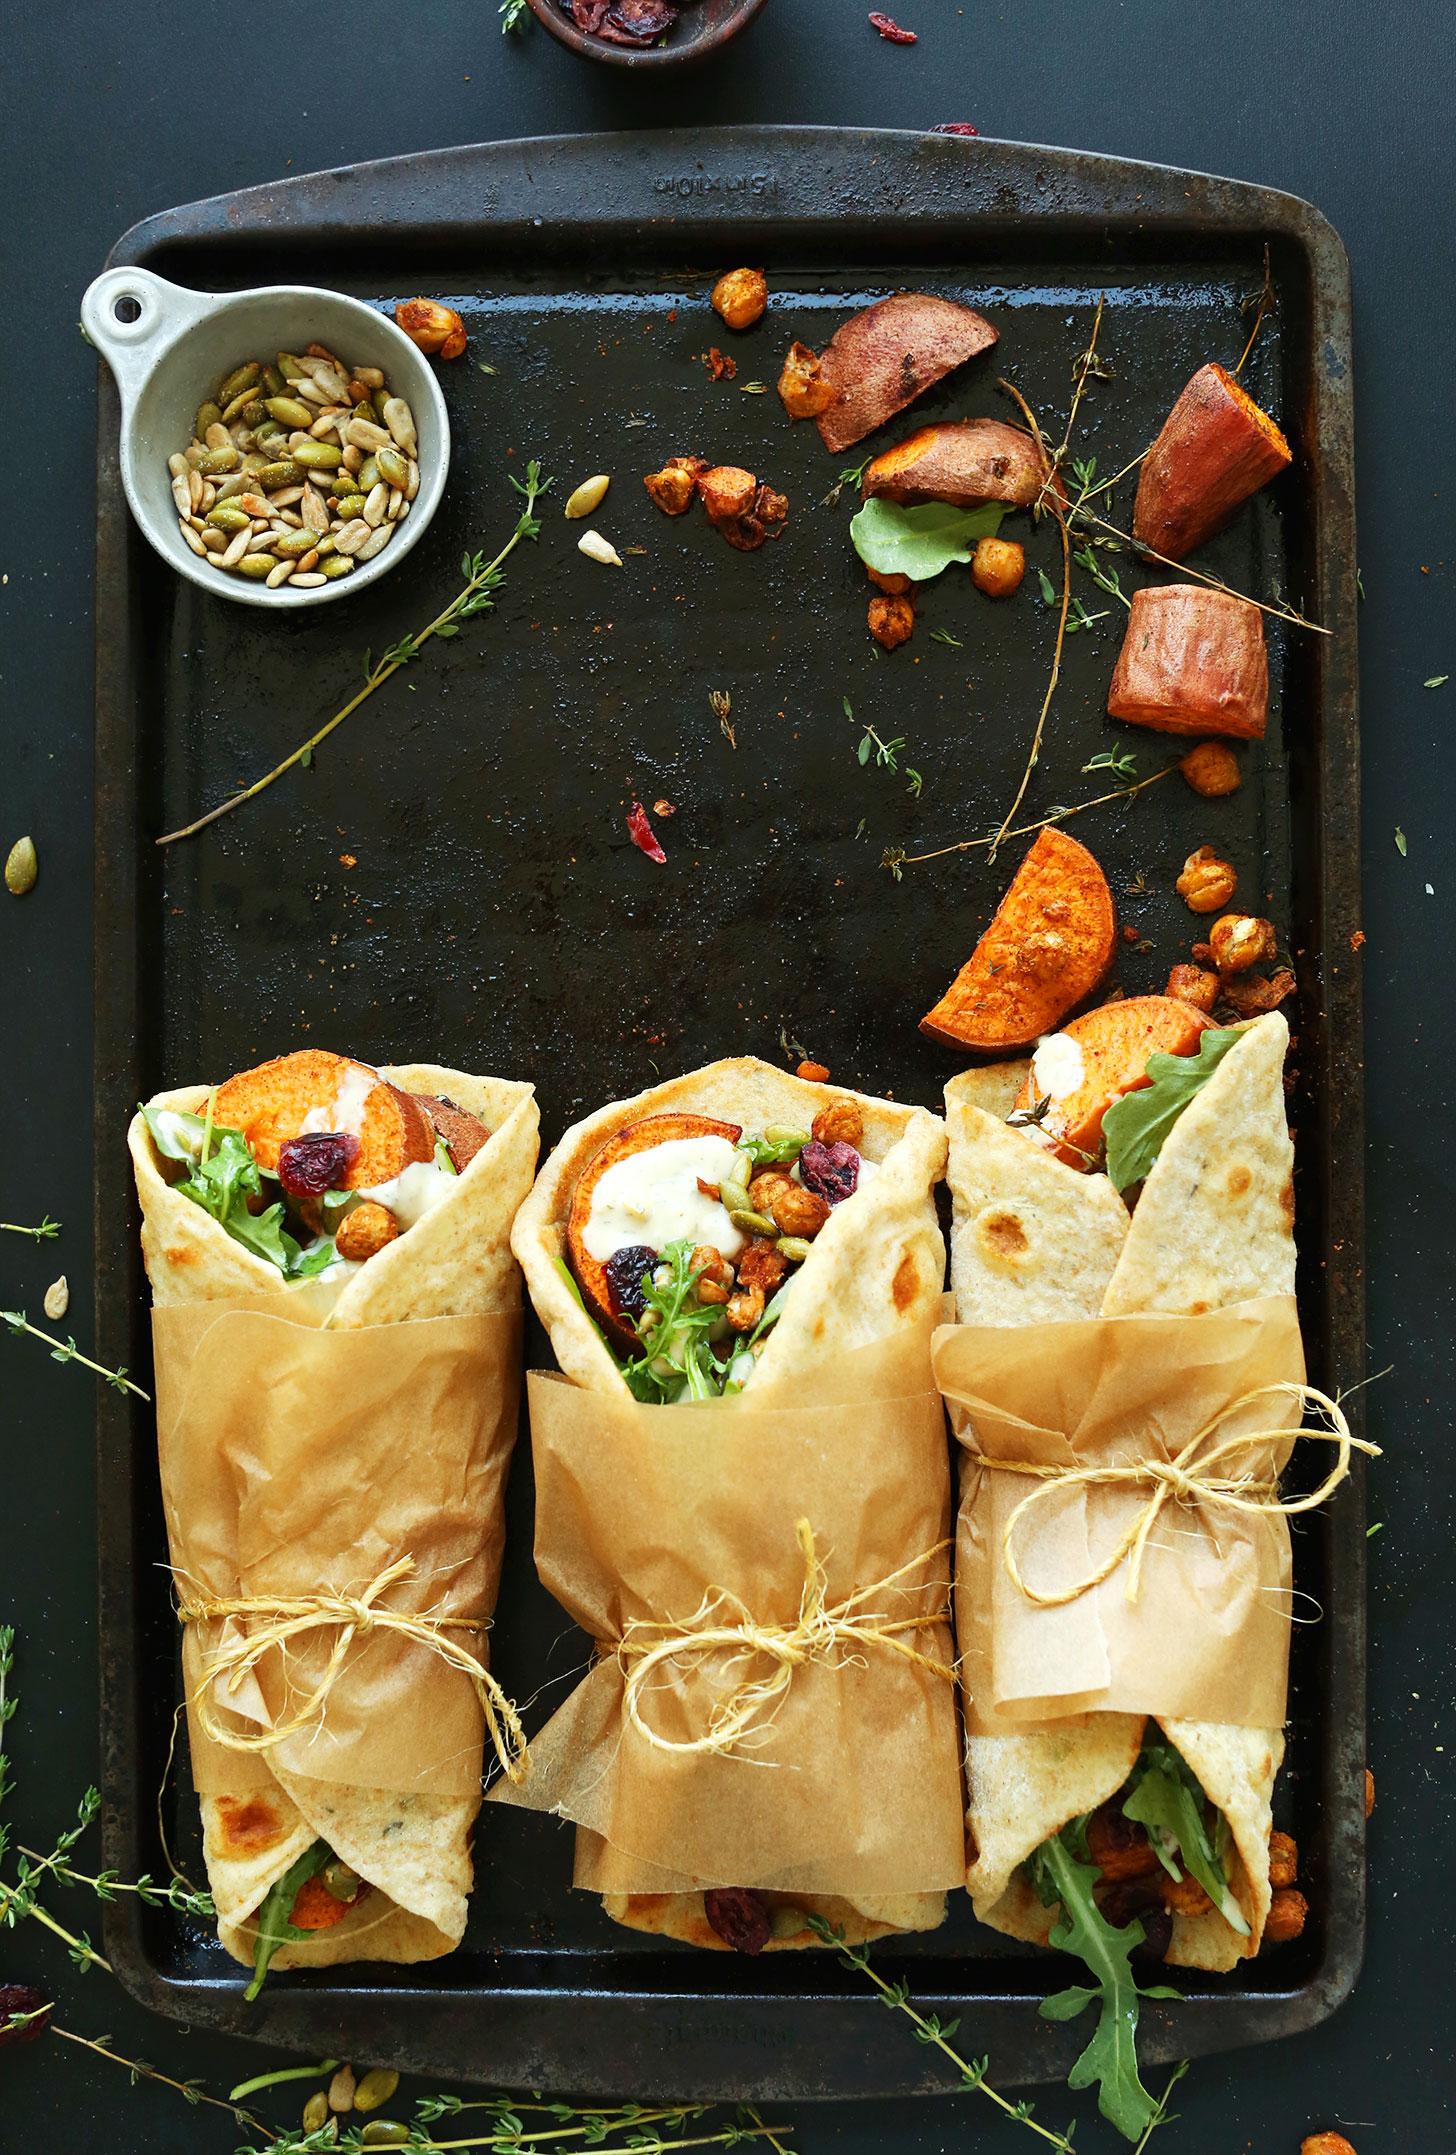 Vegan Thanksgiving Wraps by The Minimalist Baker